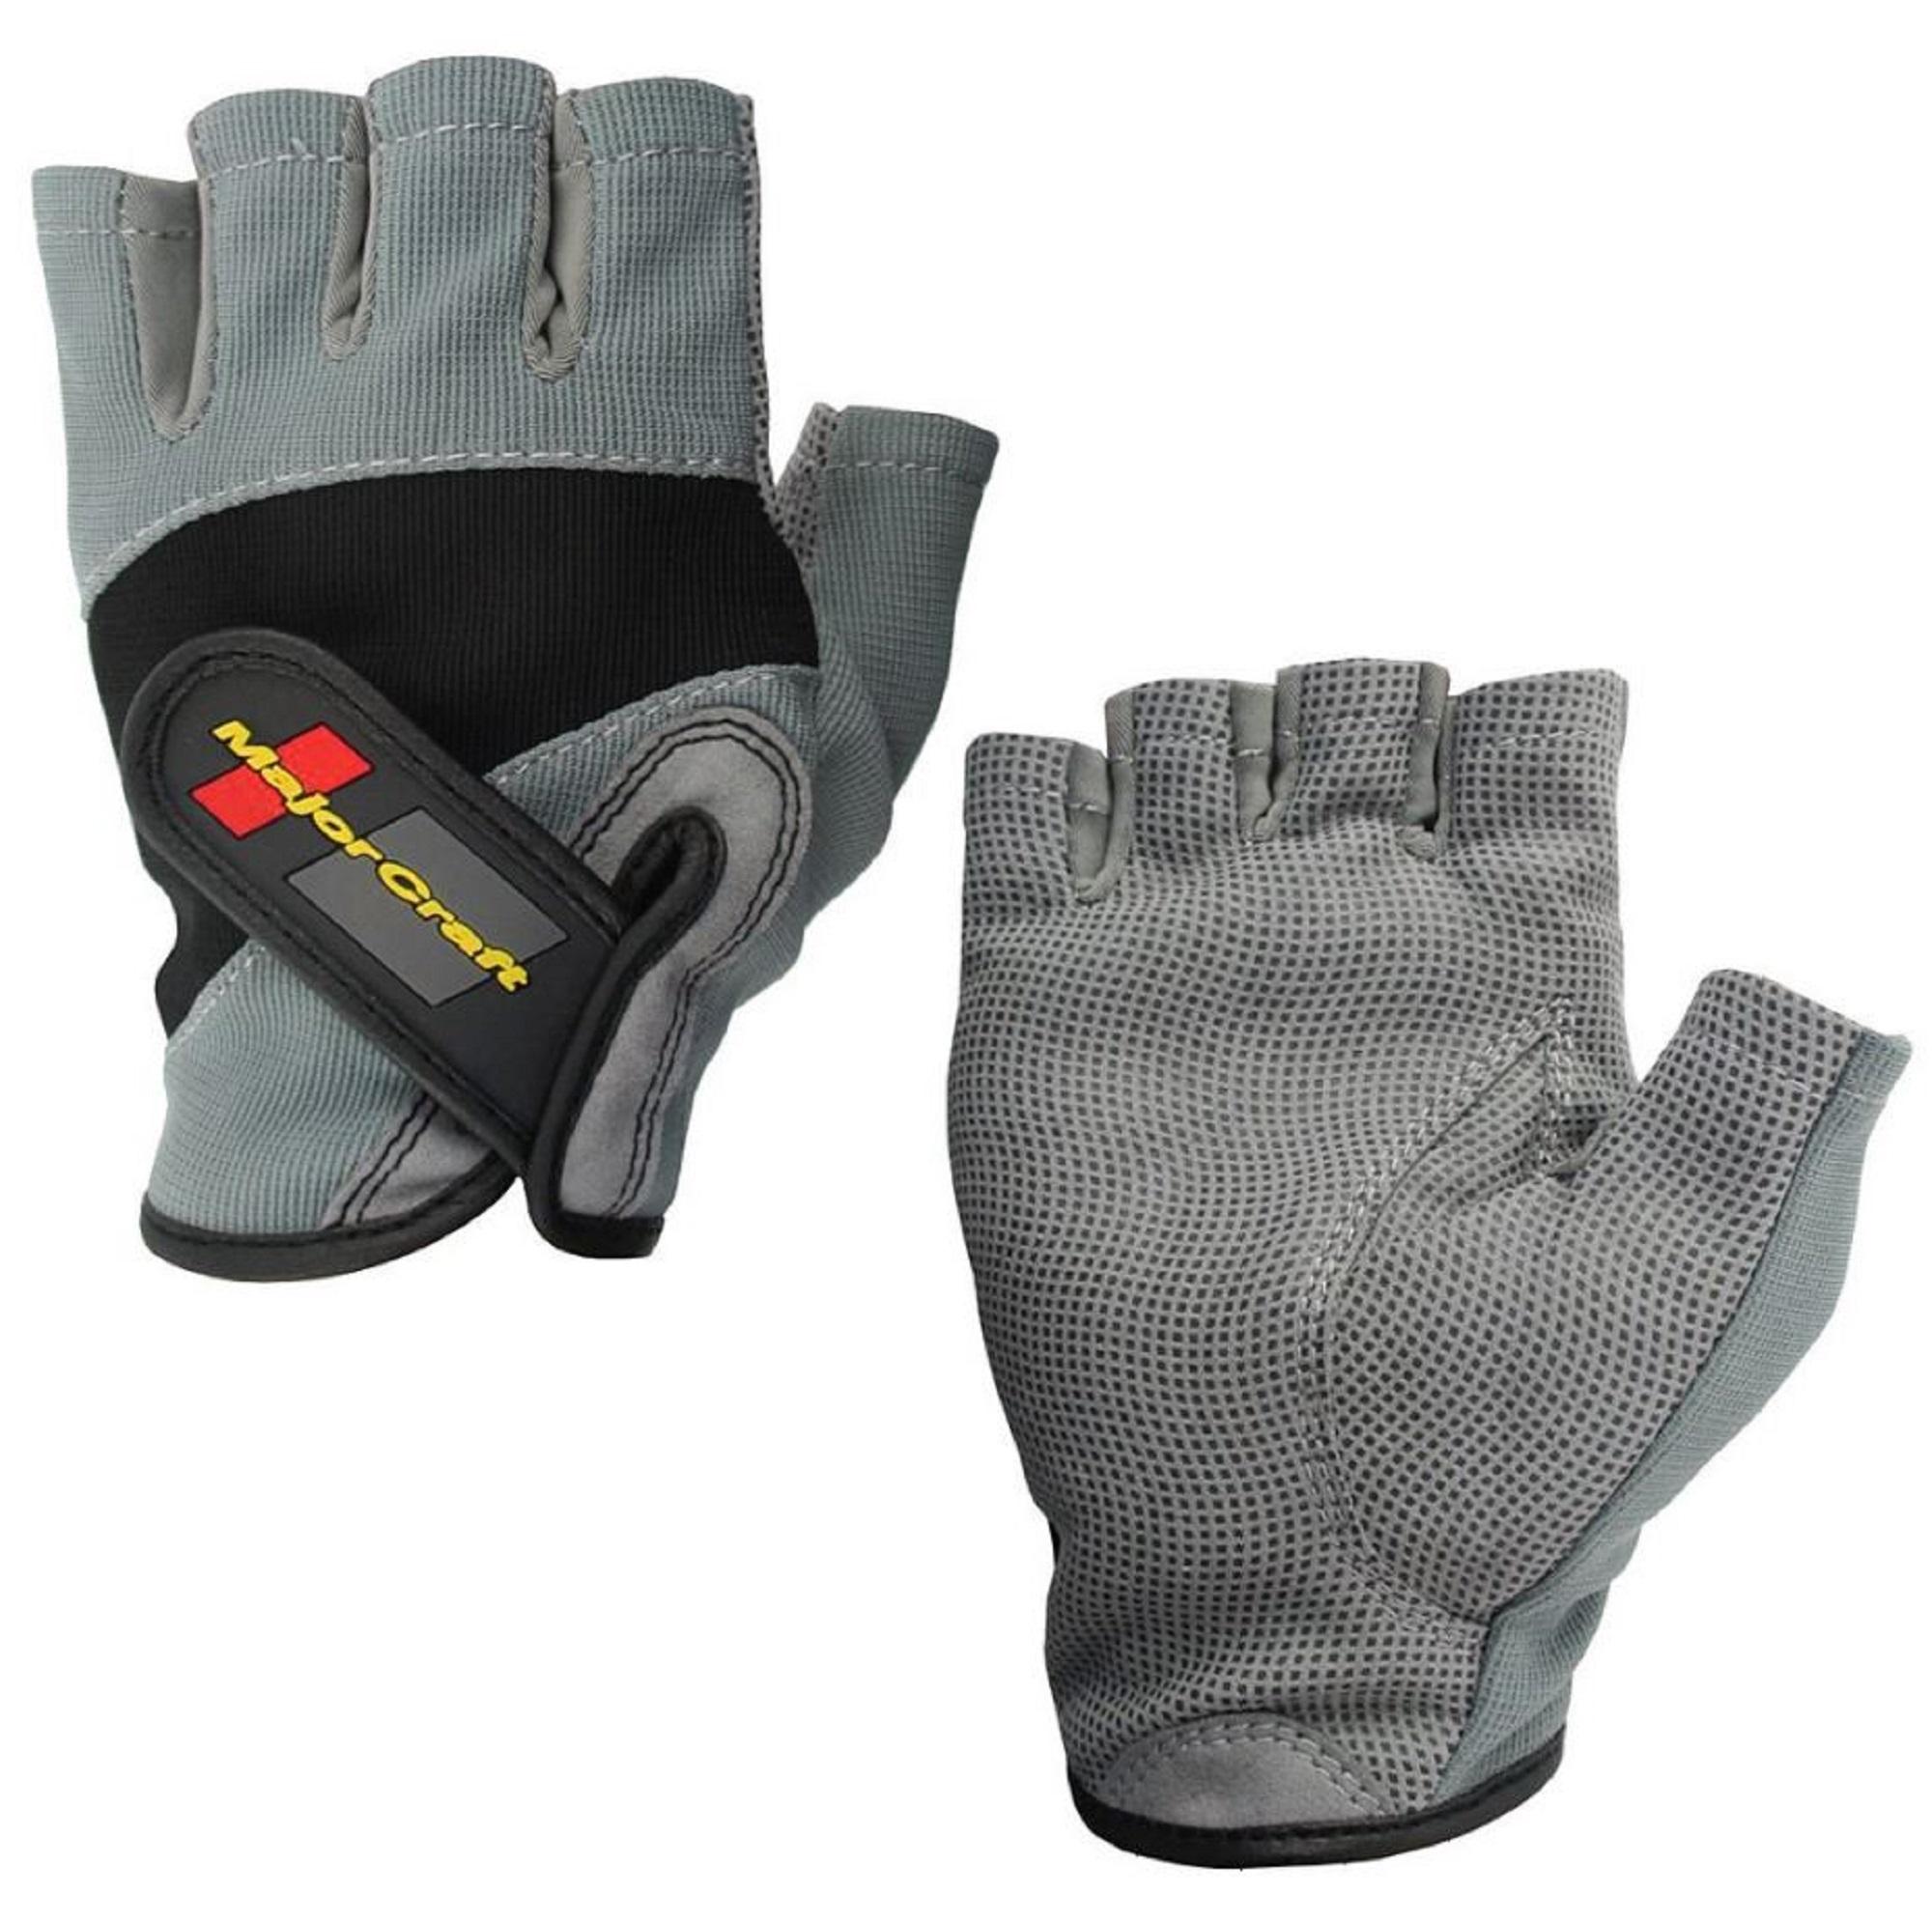 Major Craft Gloves Fishing Fingerless MCFG-5 M/GY (7106)